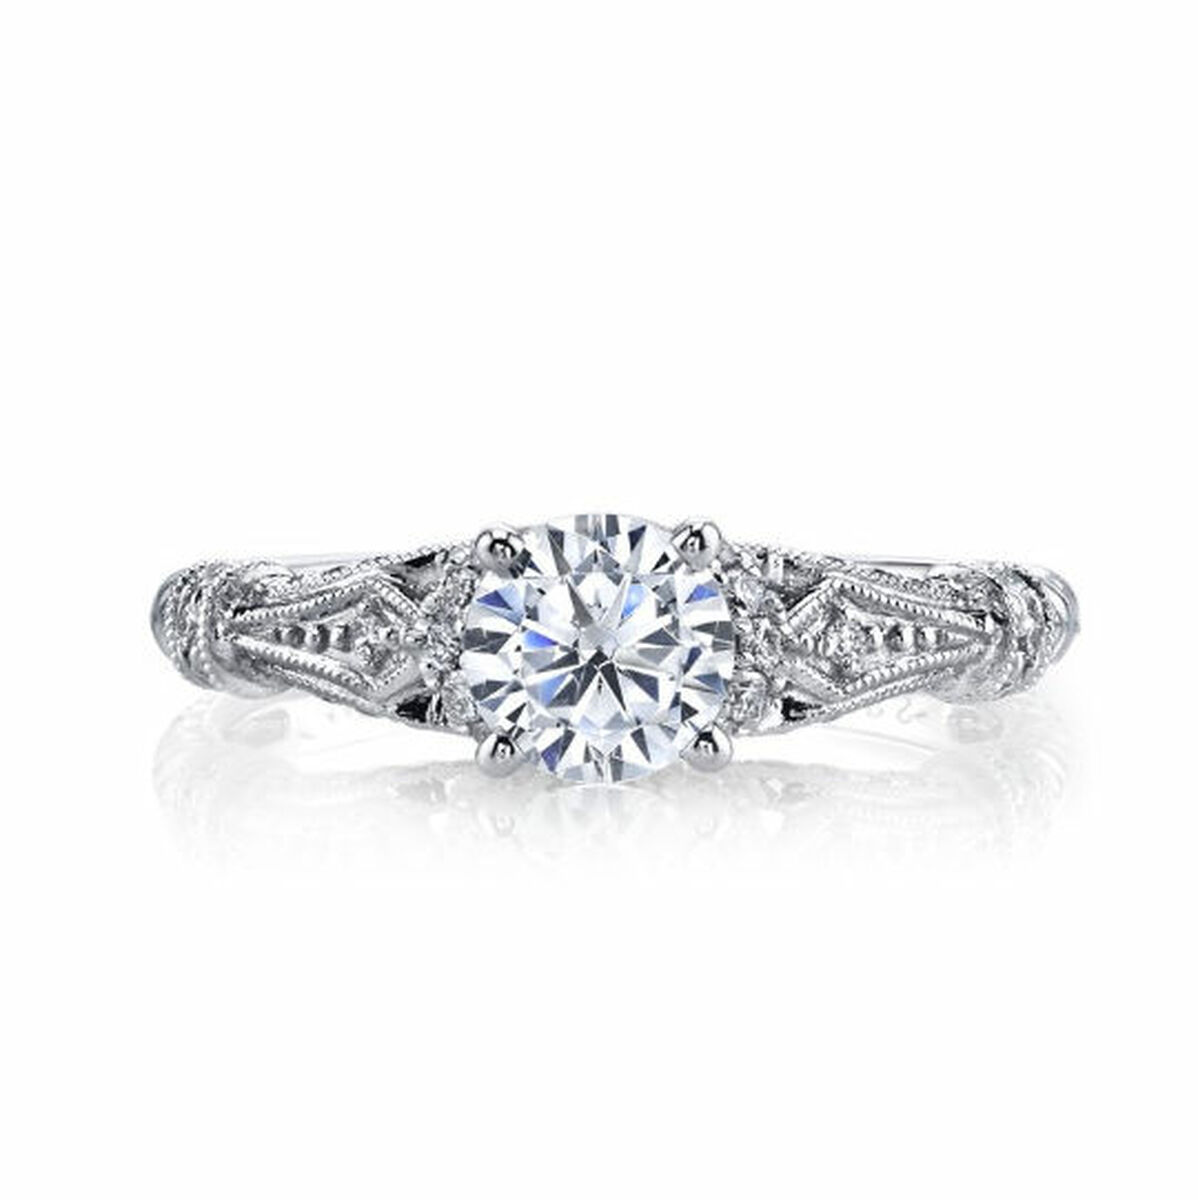 Vintage Diamond Accent Ring